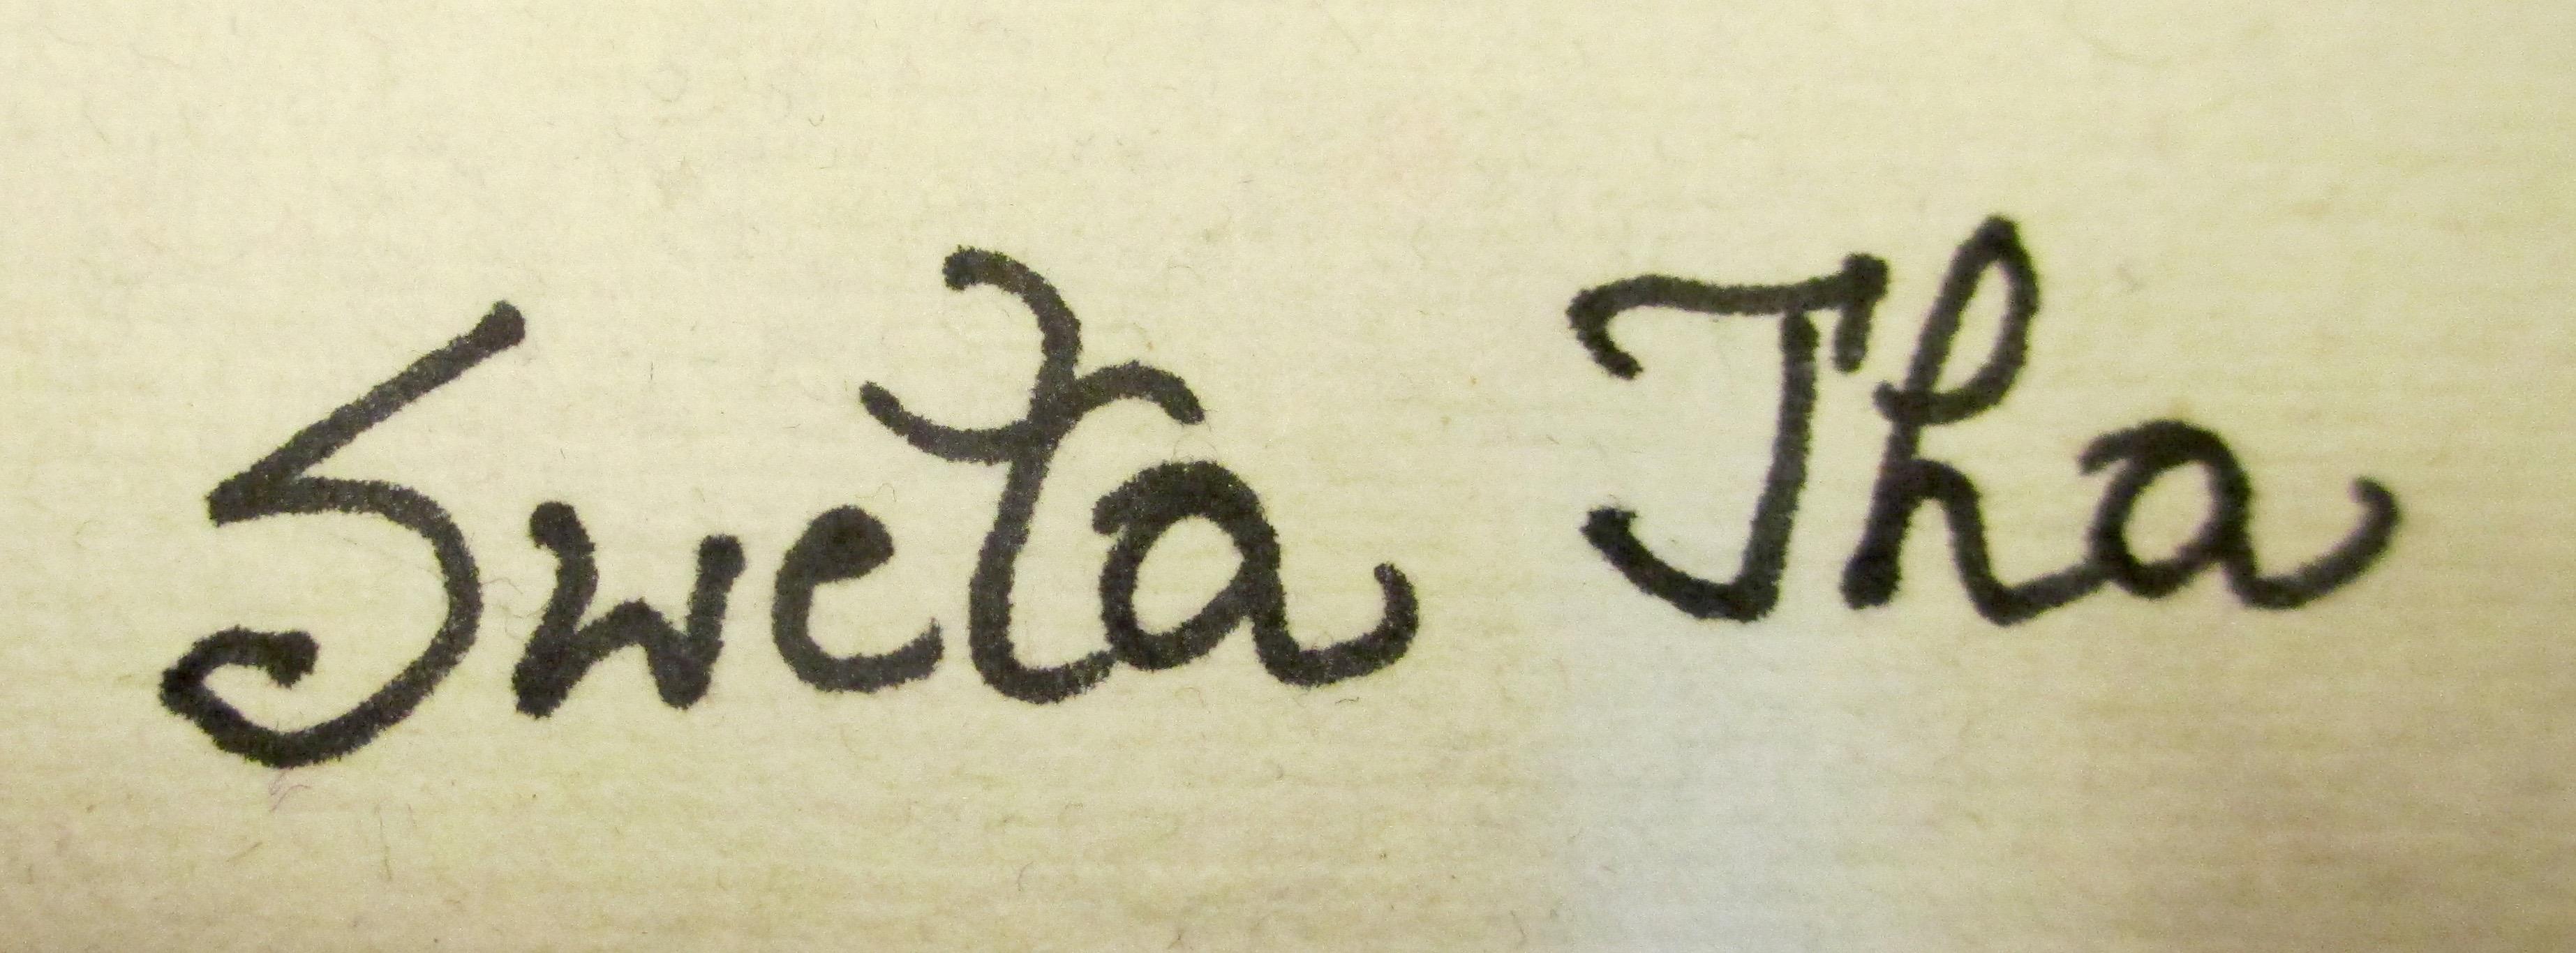 Sweta Jha Signature